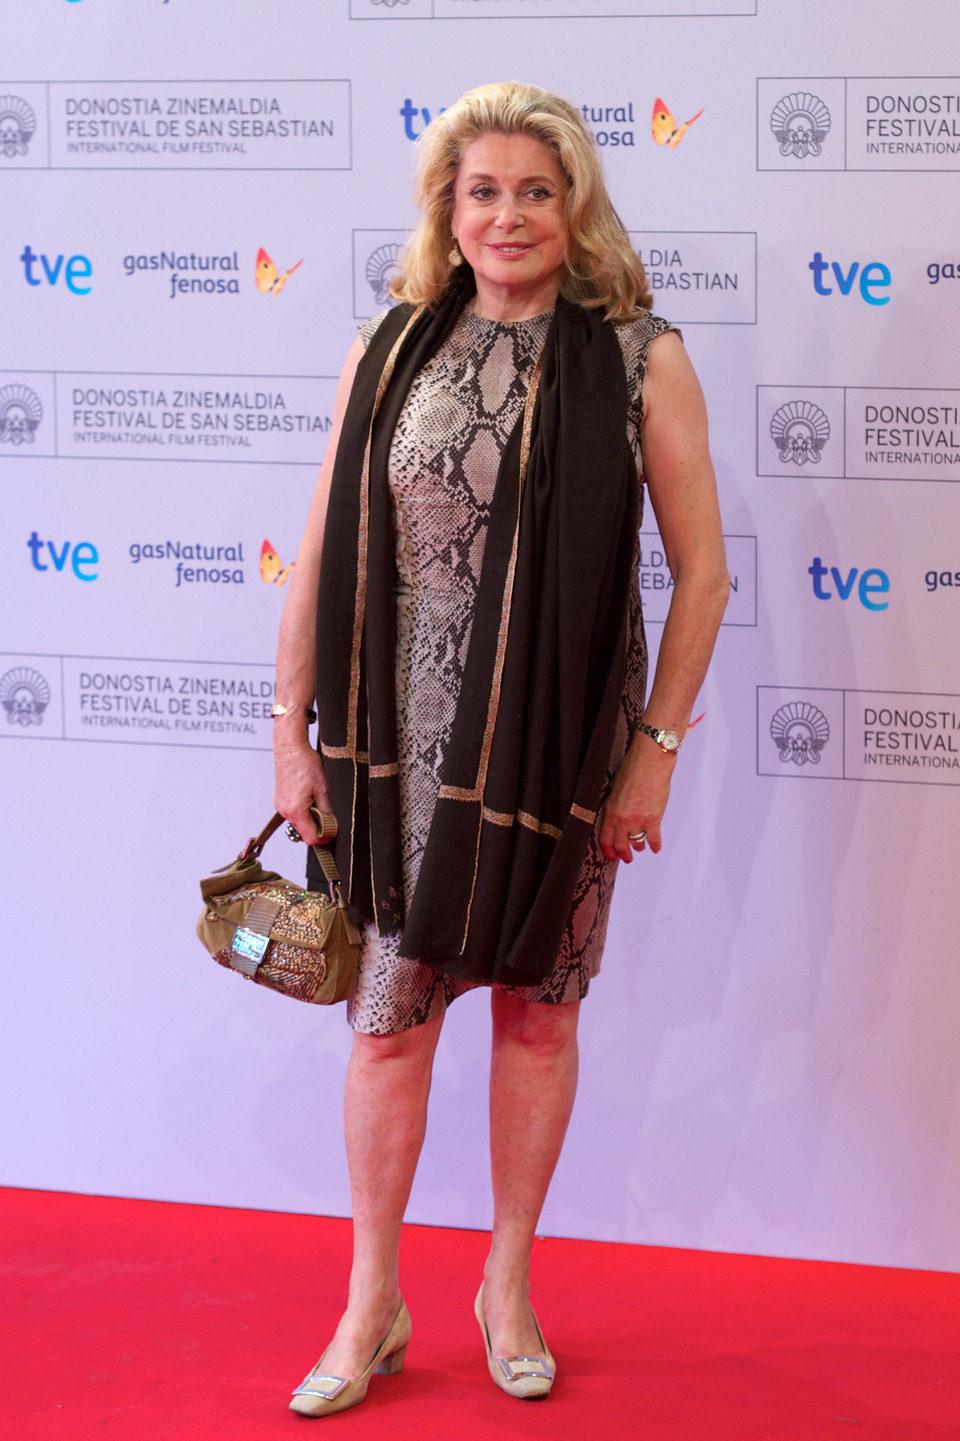 Catherine Deneuve en el Festival de San Sebastián 2012